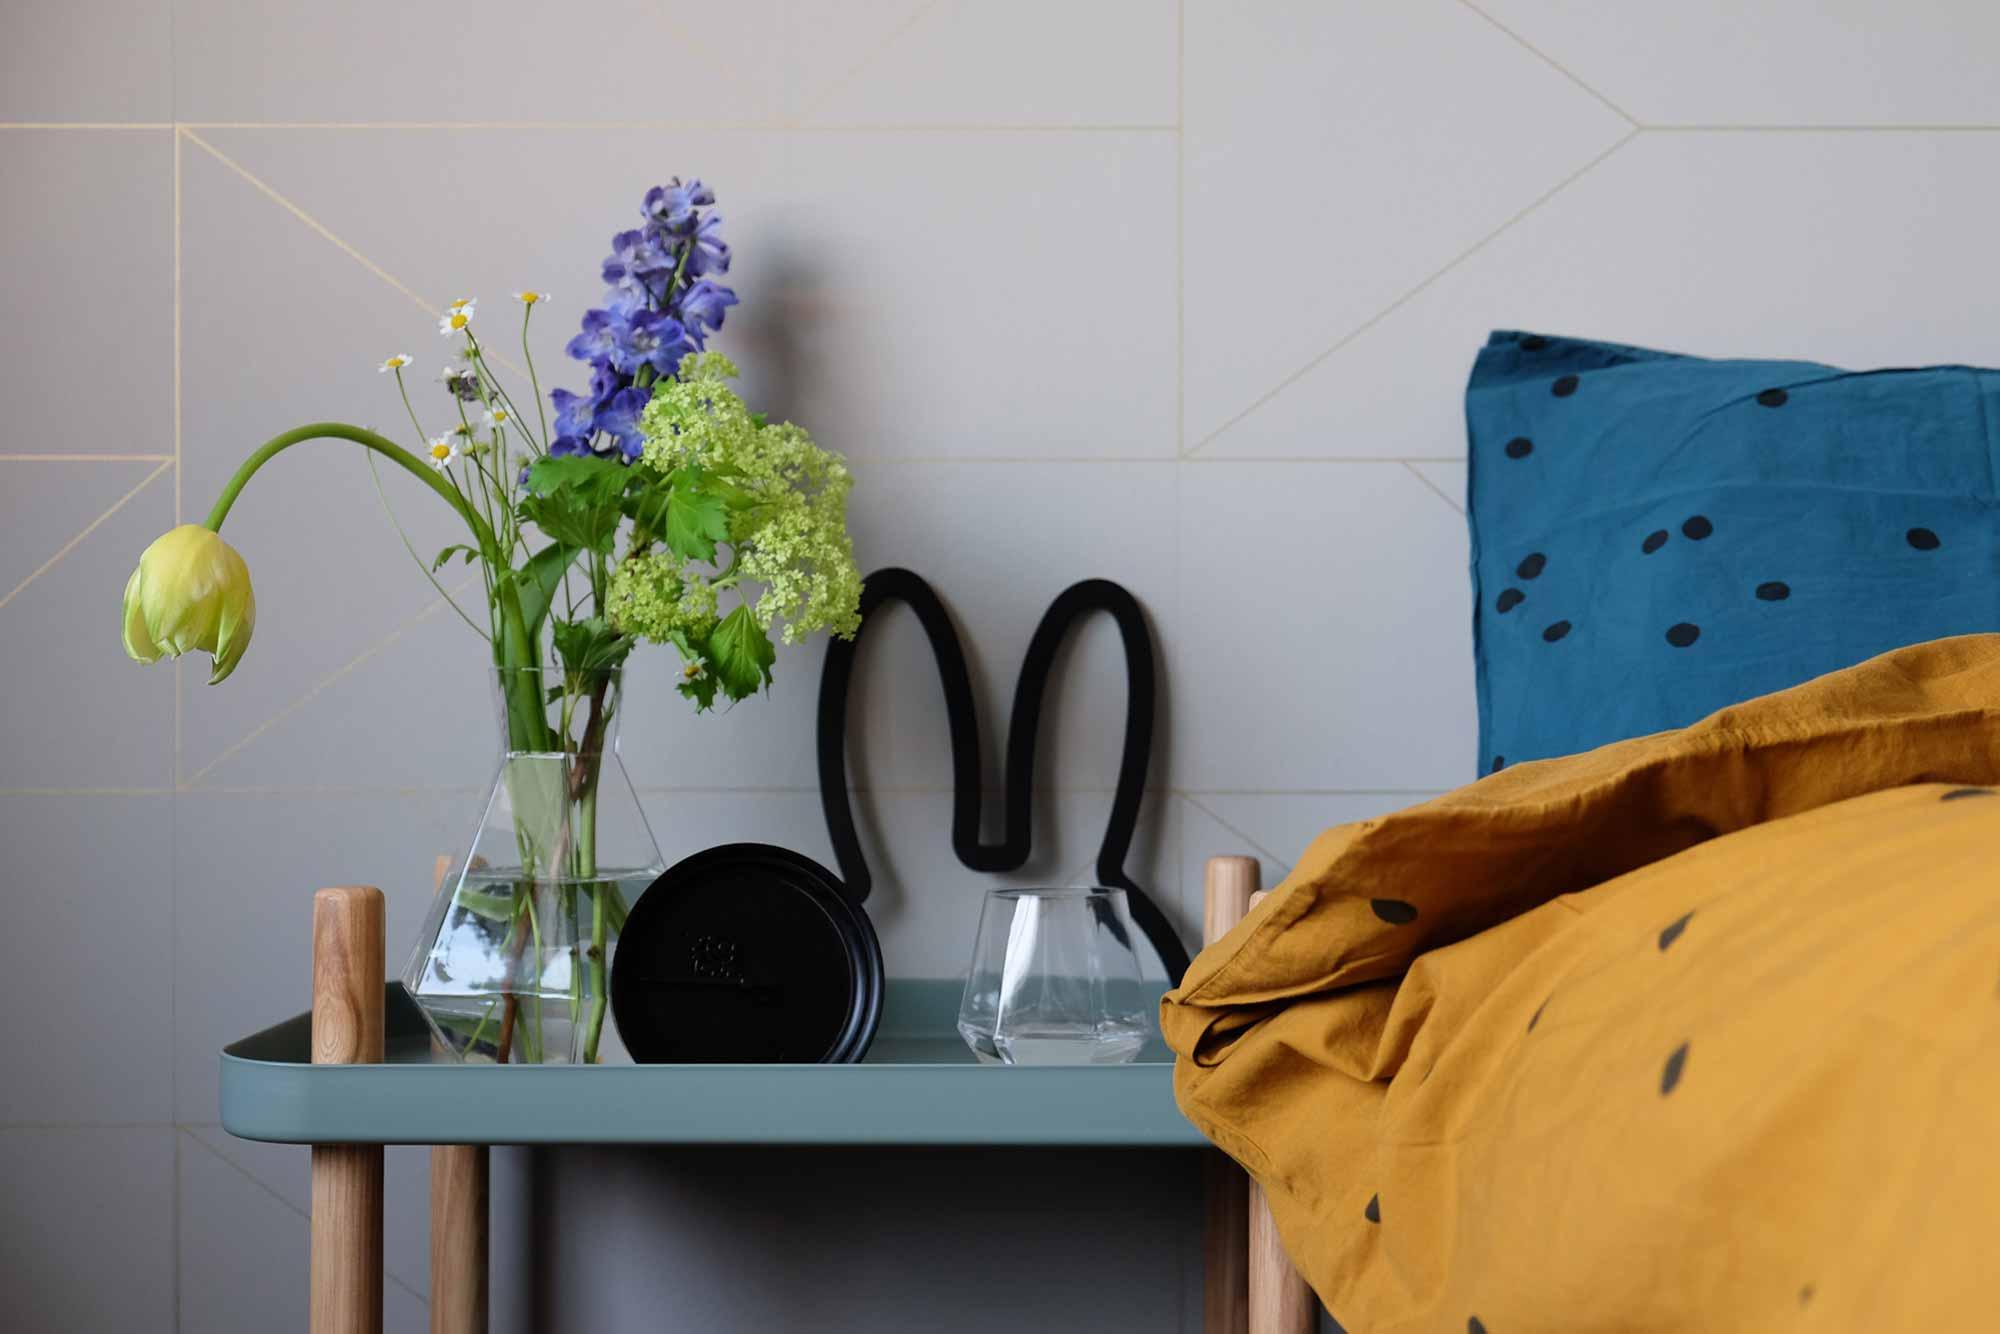 nijntje lamp slaapkamer blogger prchtg